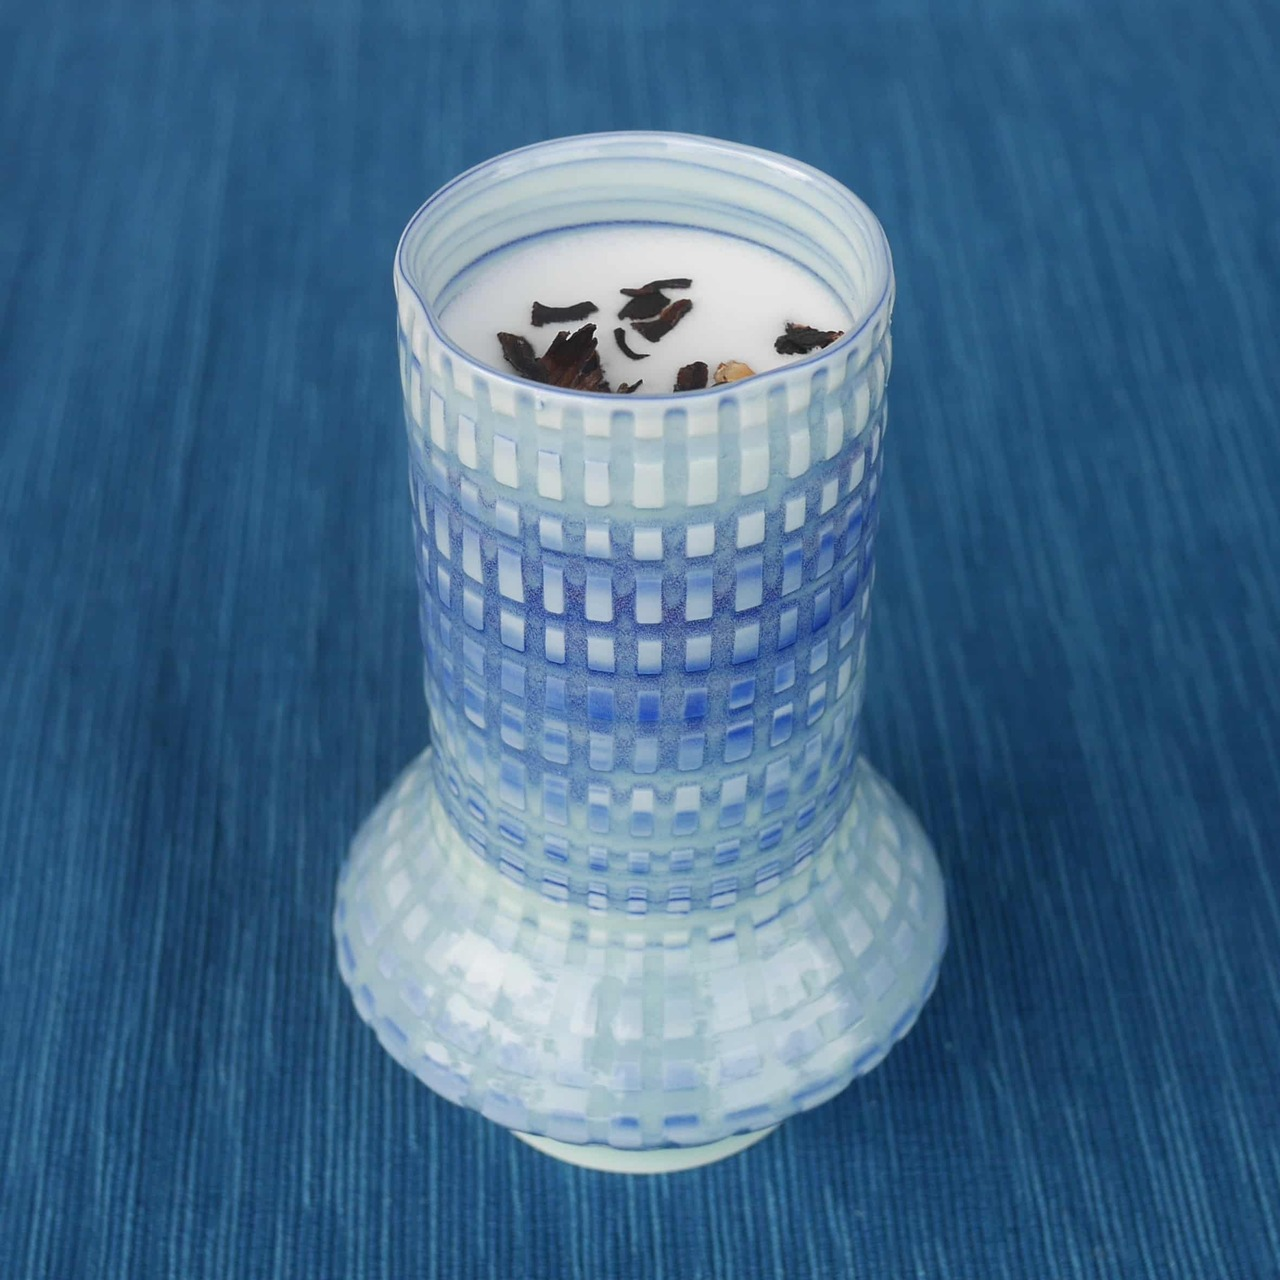 CapKaroso- Cocktail glass